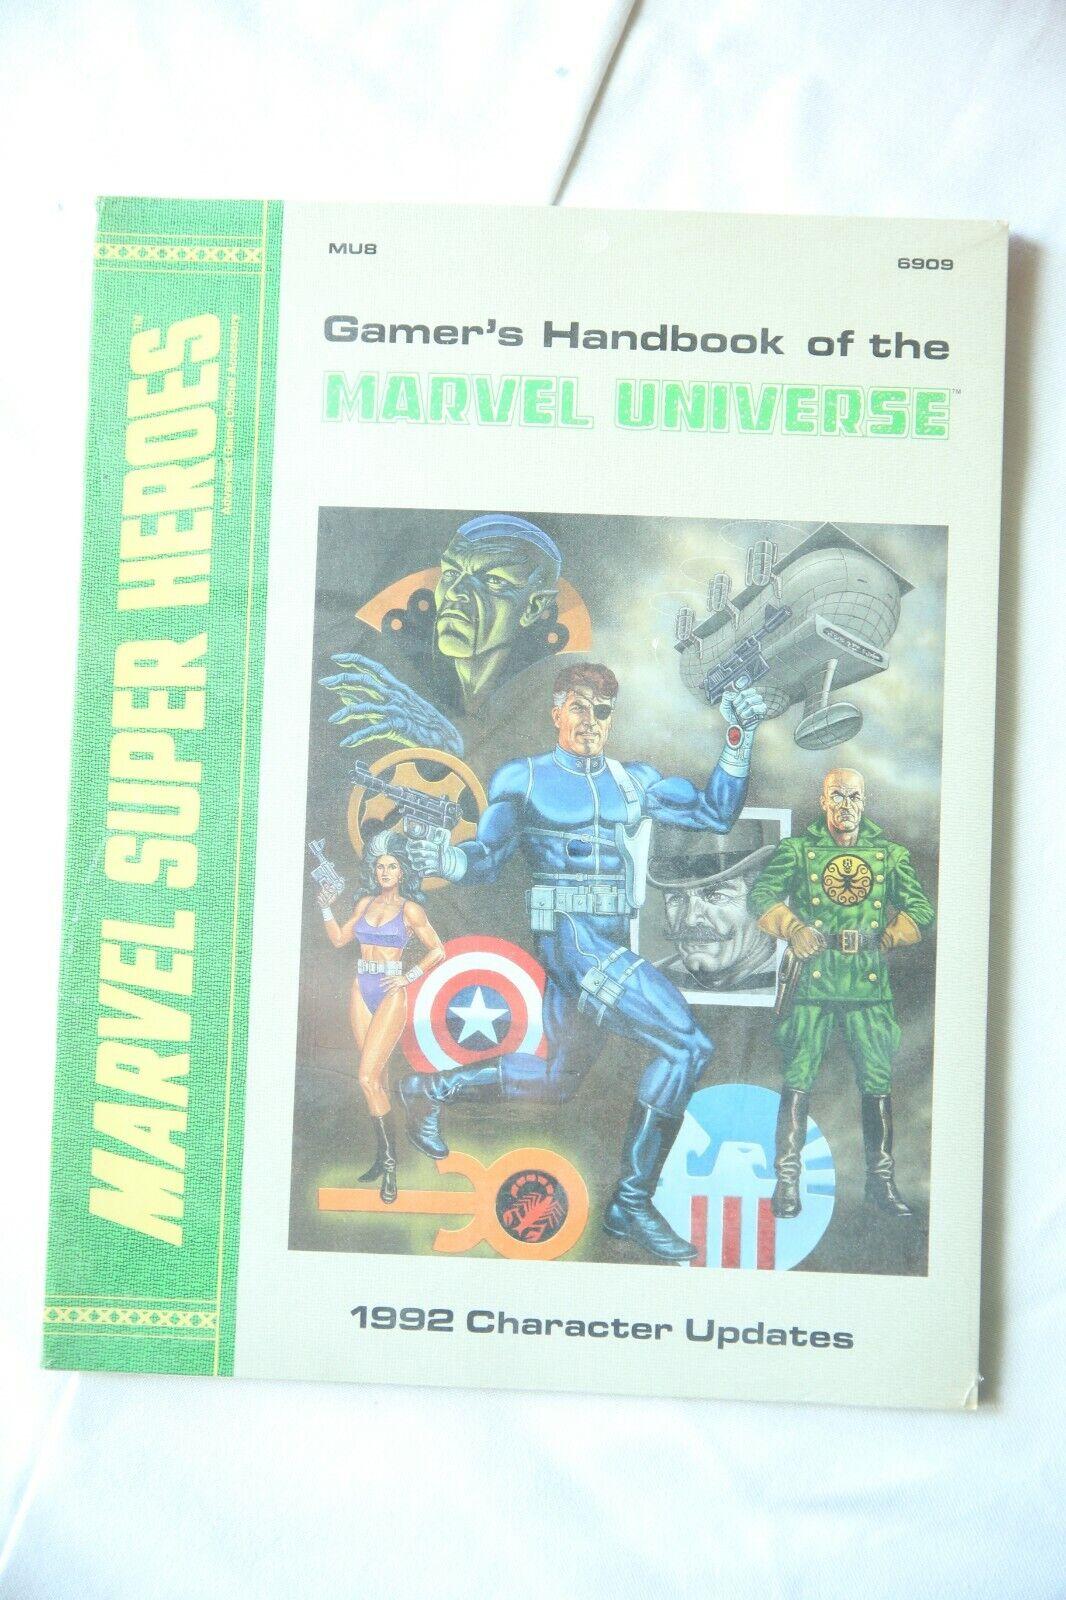 Gamer's Handbook of the Marvel Universe 1992 Character Updates TSR MU8 6909 NEW